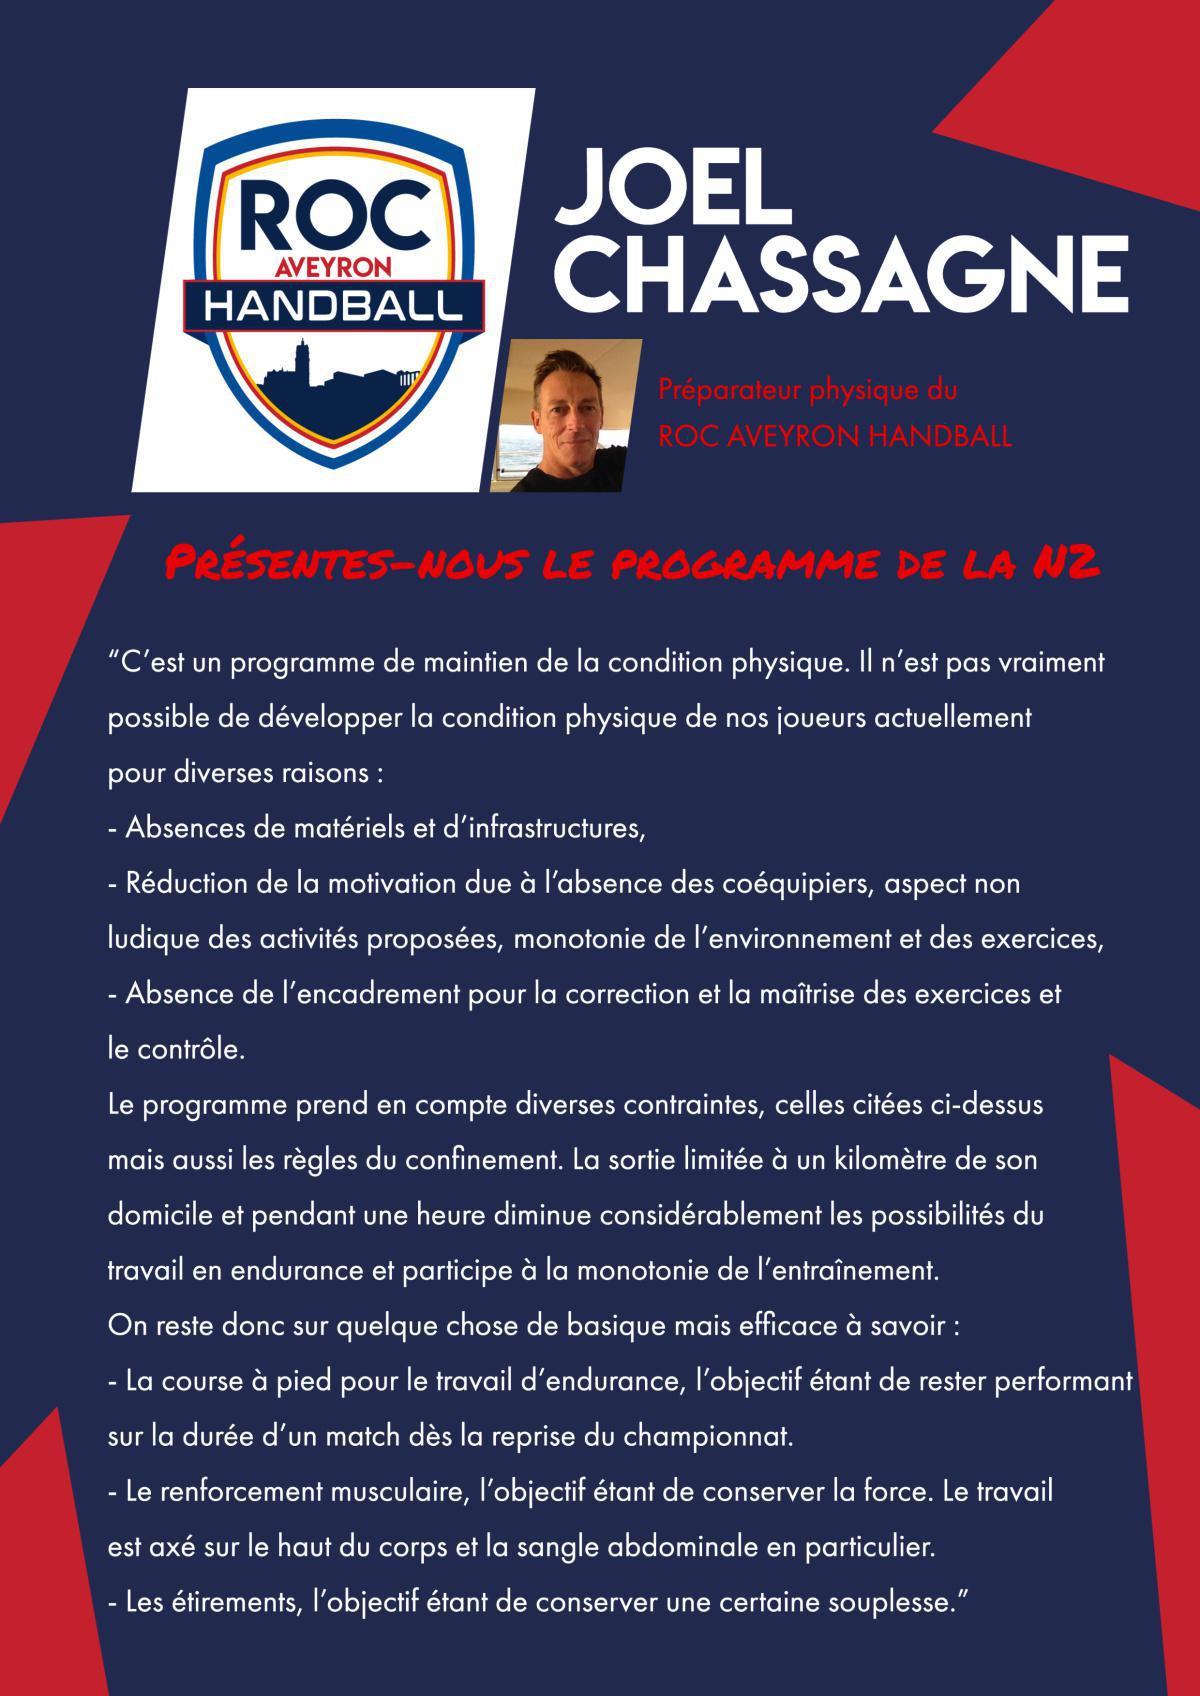 Interview de Joel Chassagne